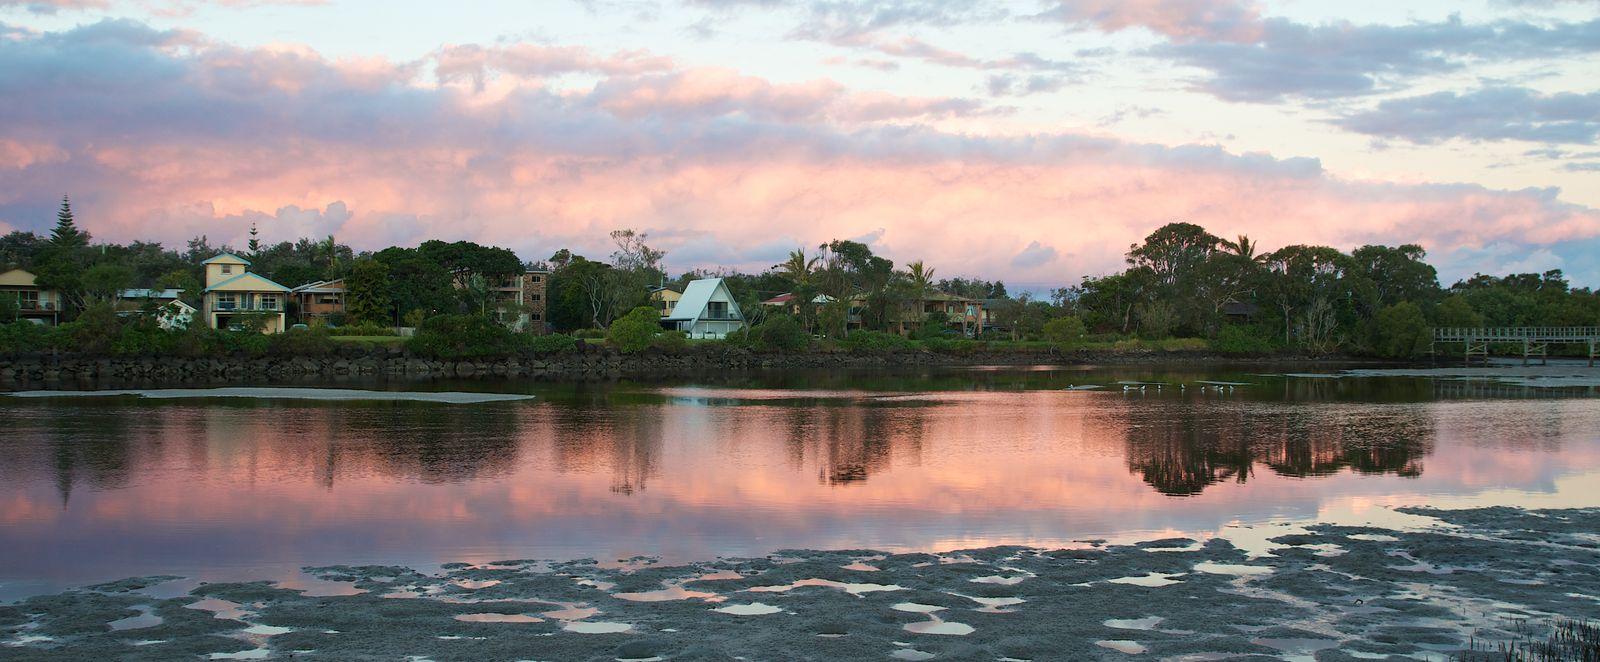 River View of Brunswick Heads New South Wales Australia